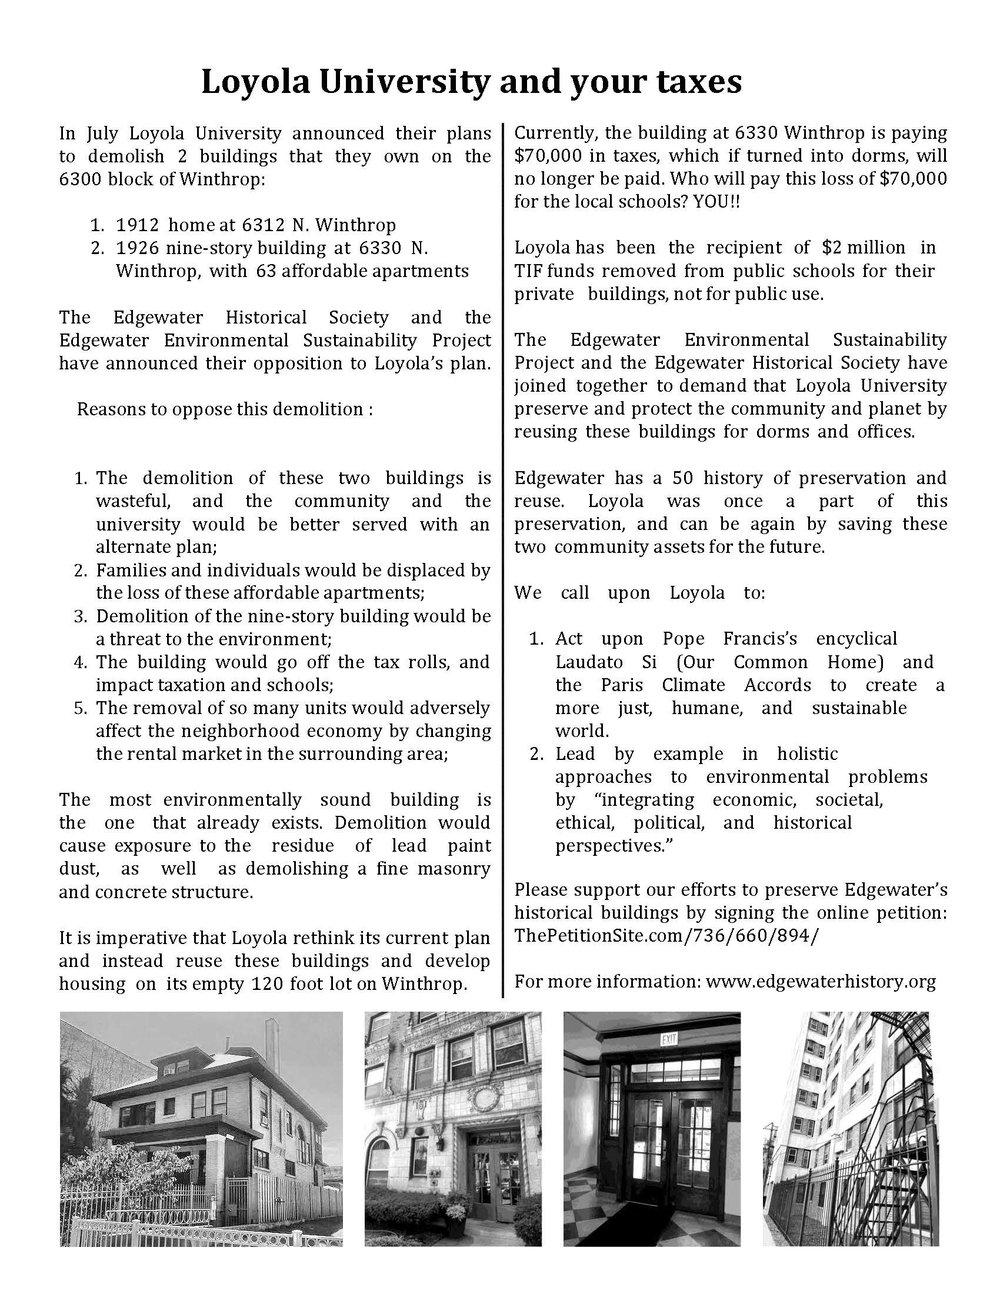 petition flyer2c.jpg